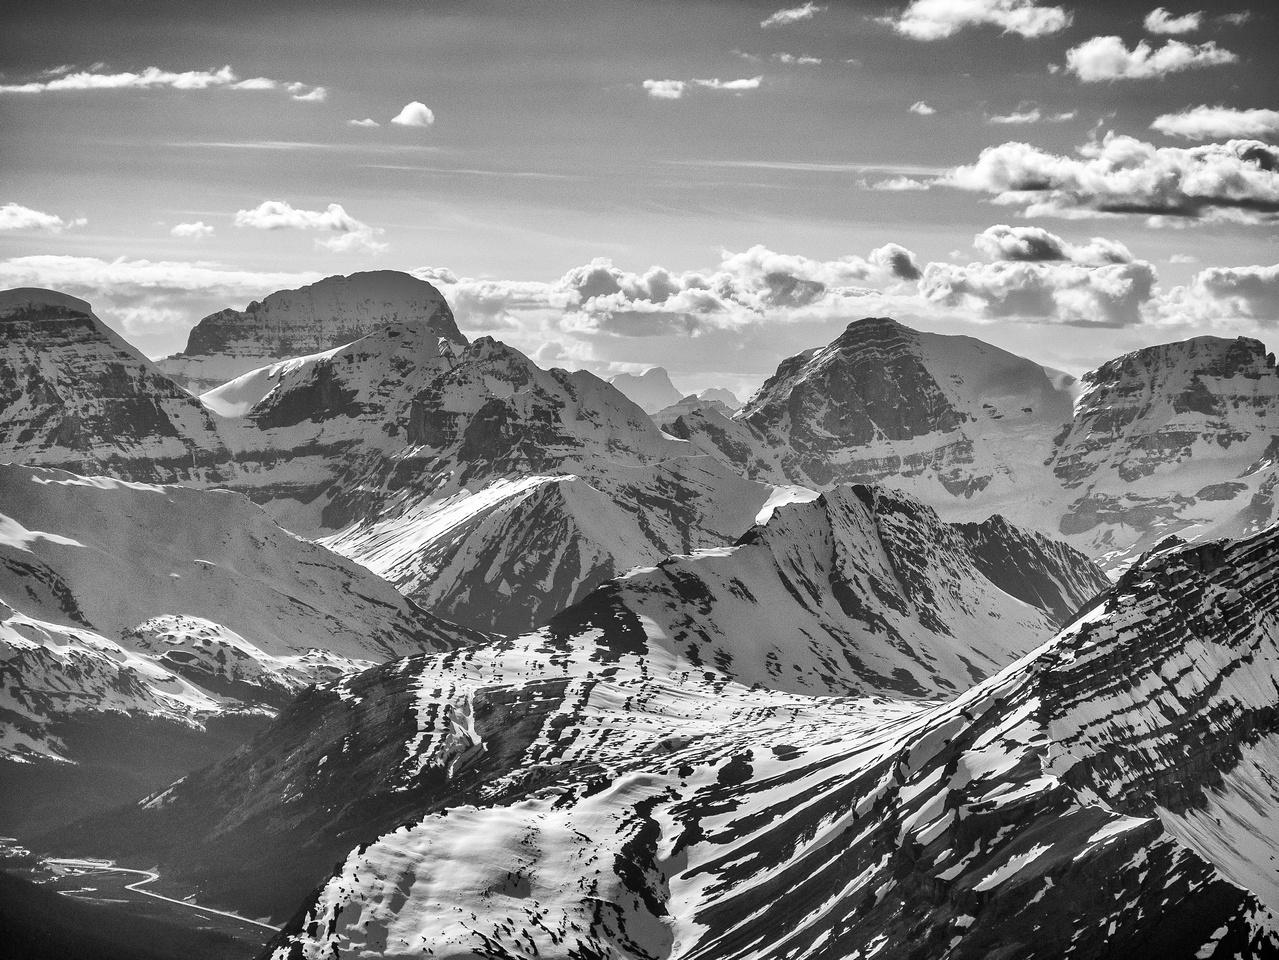 Mounts Alberta, Engelhard, Woolley and Diadem (L to R).